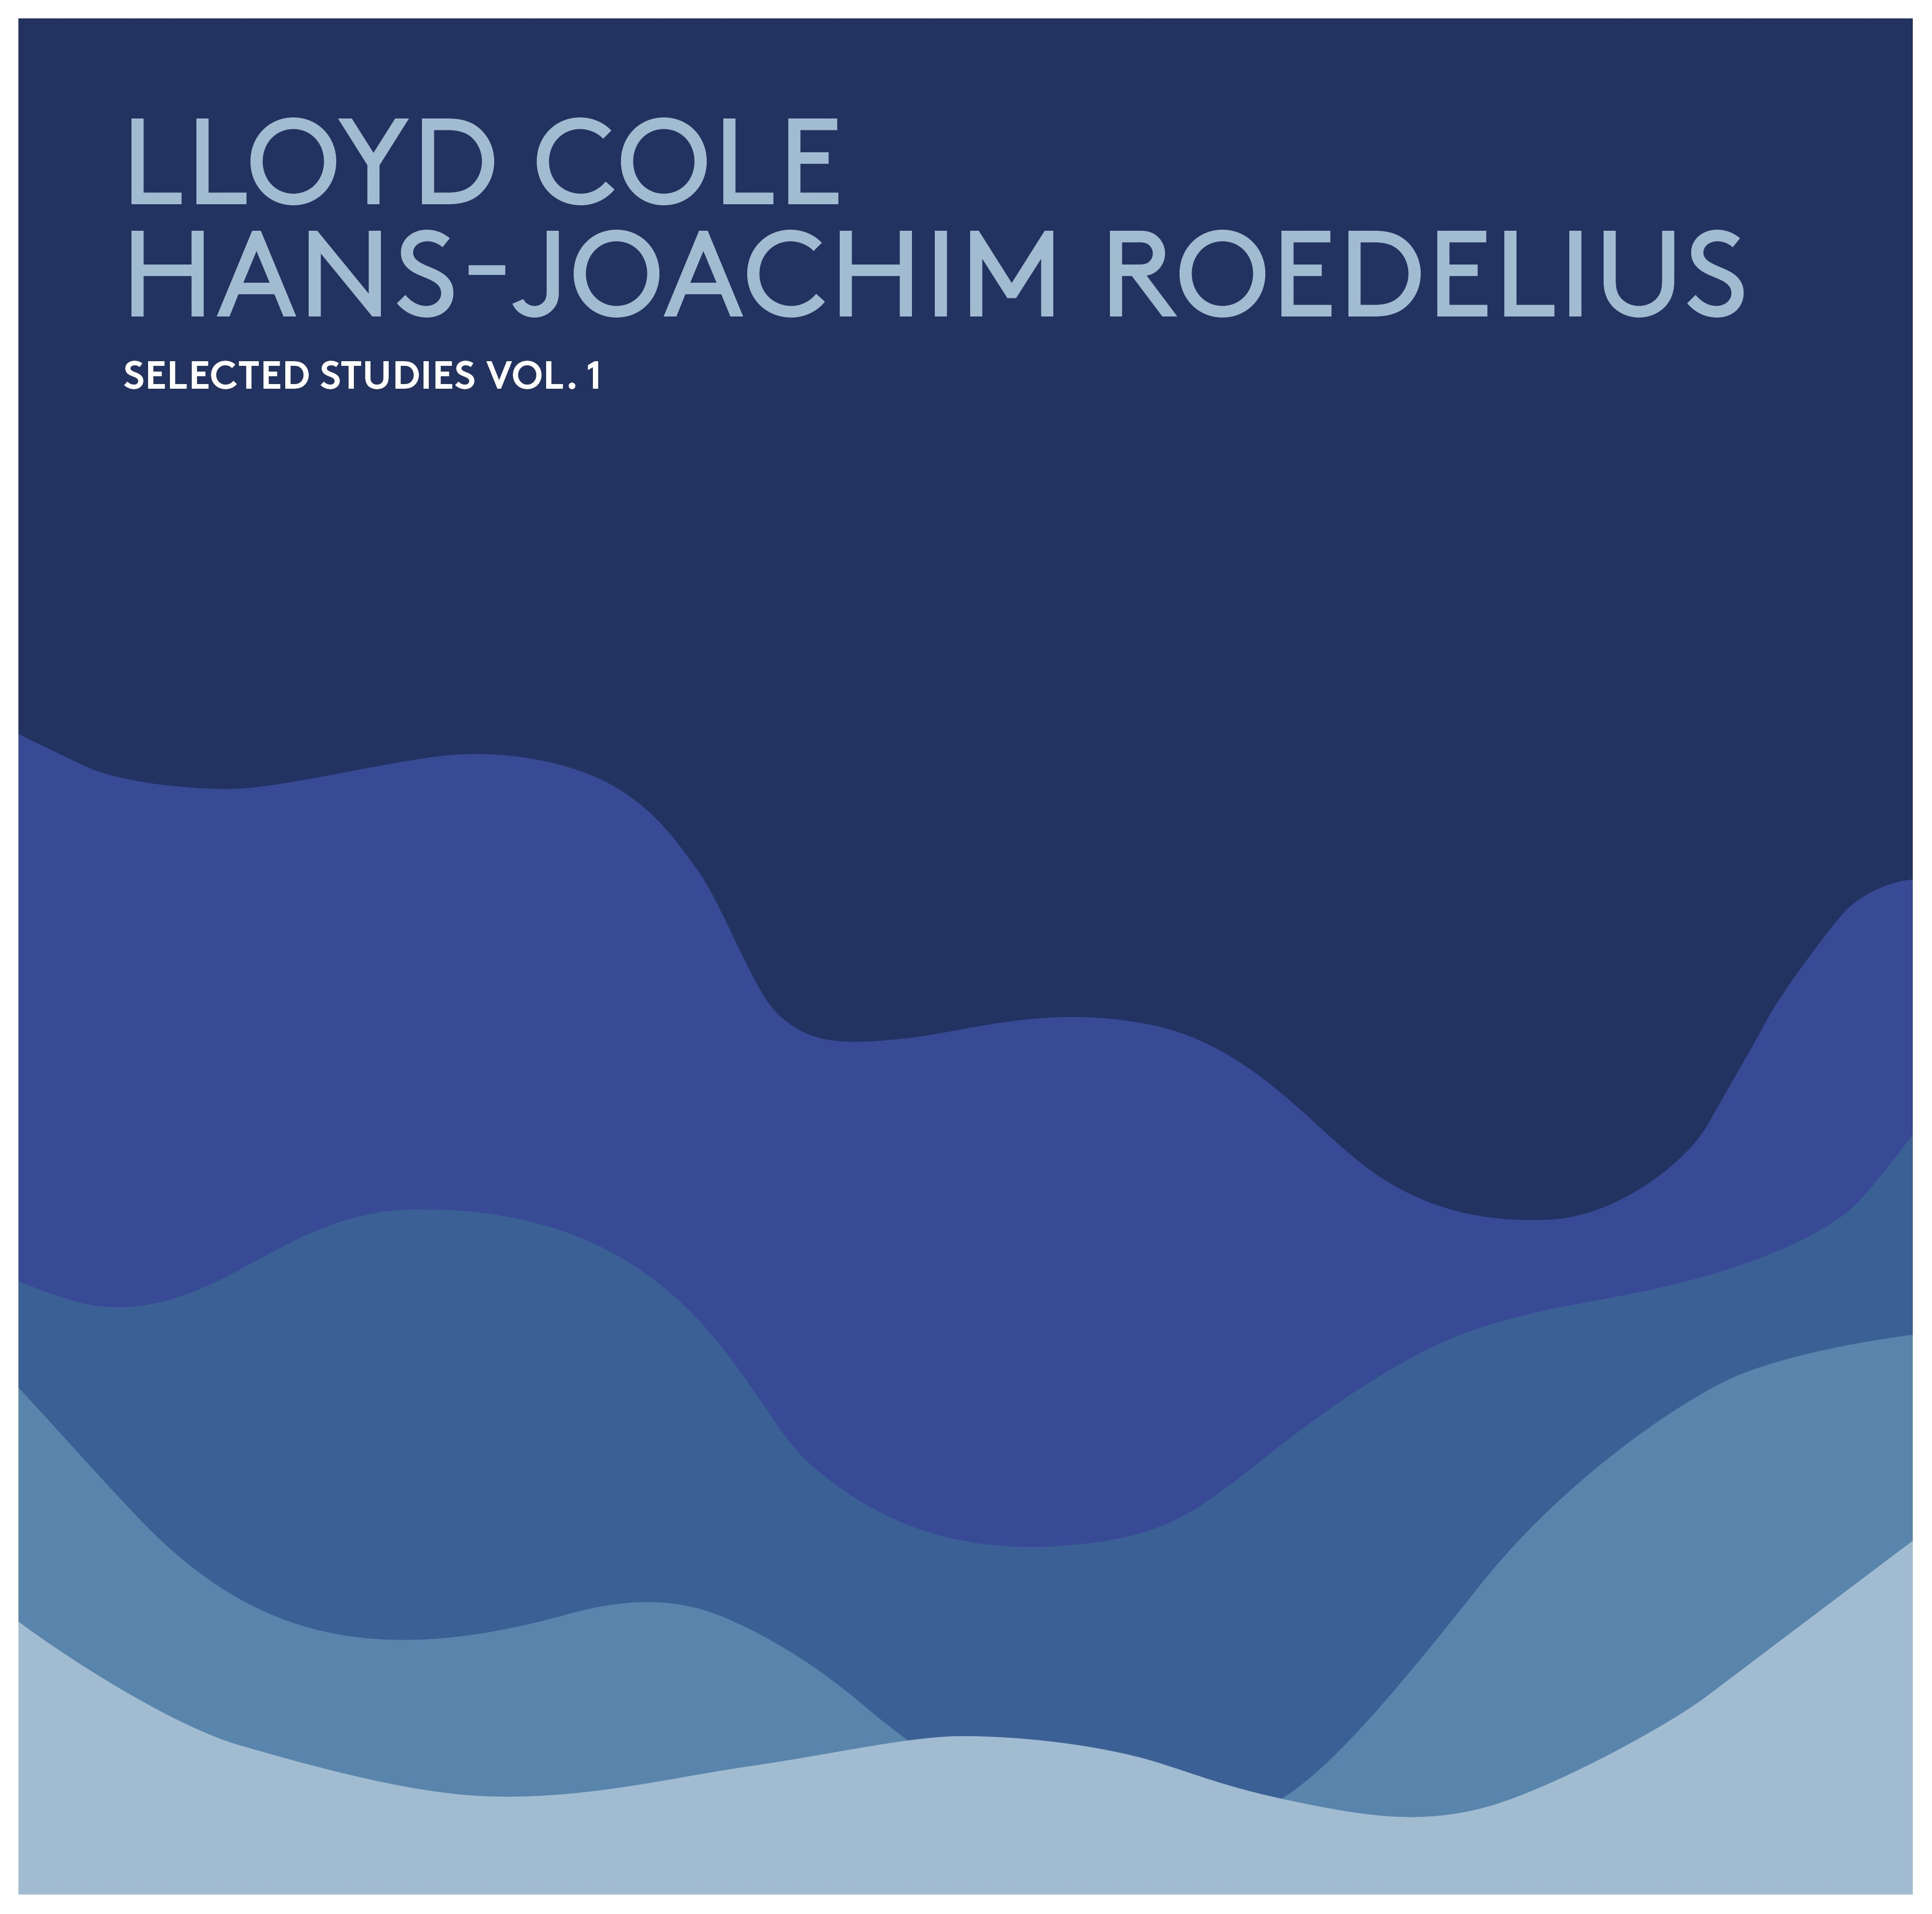 Hans-Joachim Roedelius & Lloyd Cole – Elektronik-Pionier triff auf Songwriter